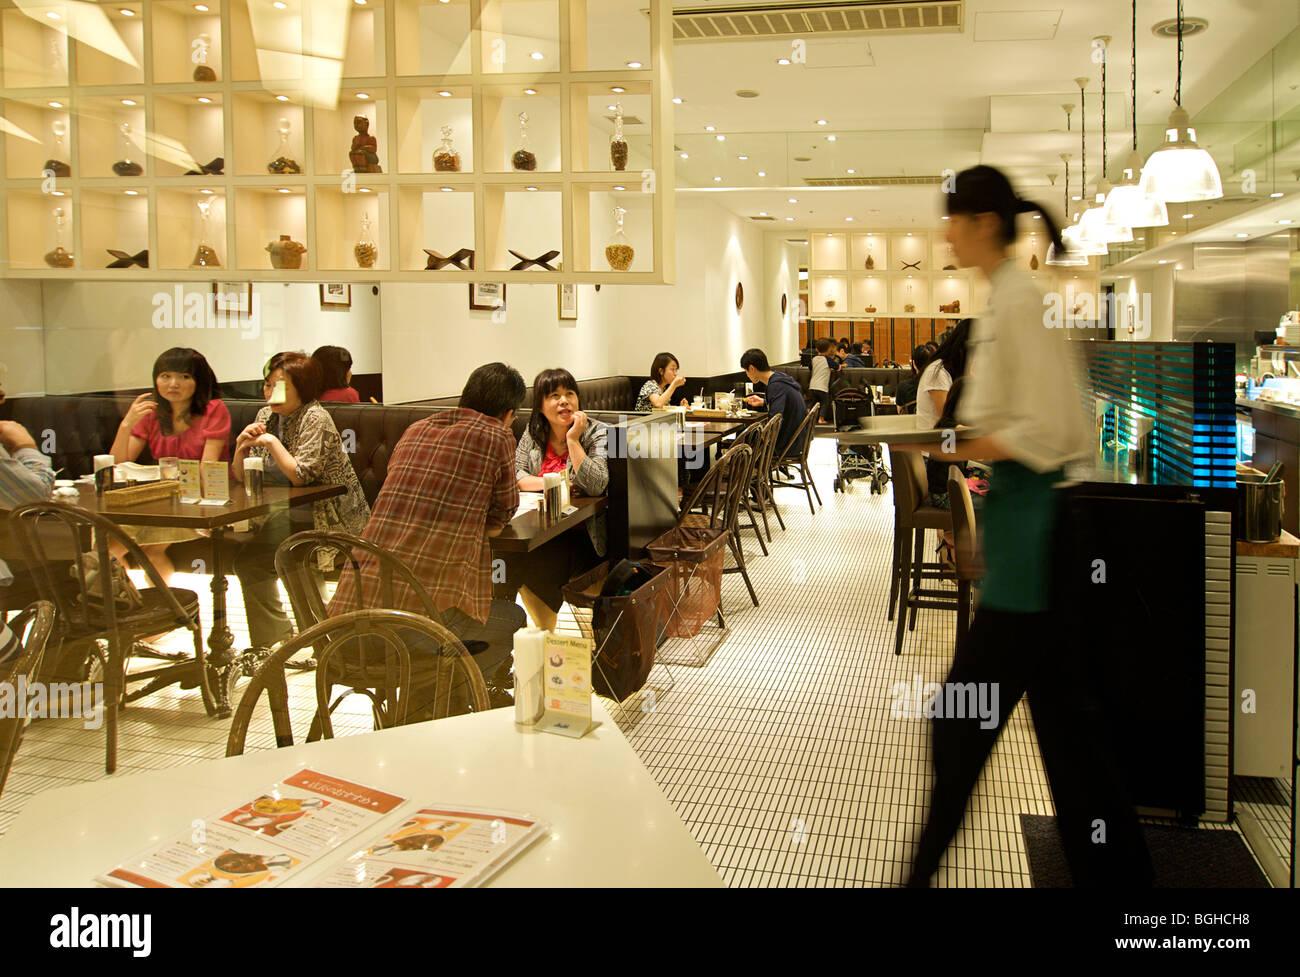 Busy restaurant in Mori Tower, Roppongi Hills, Tokyo, Japan - Stock Image